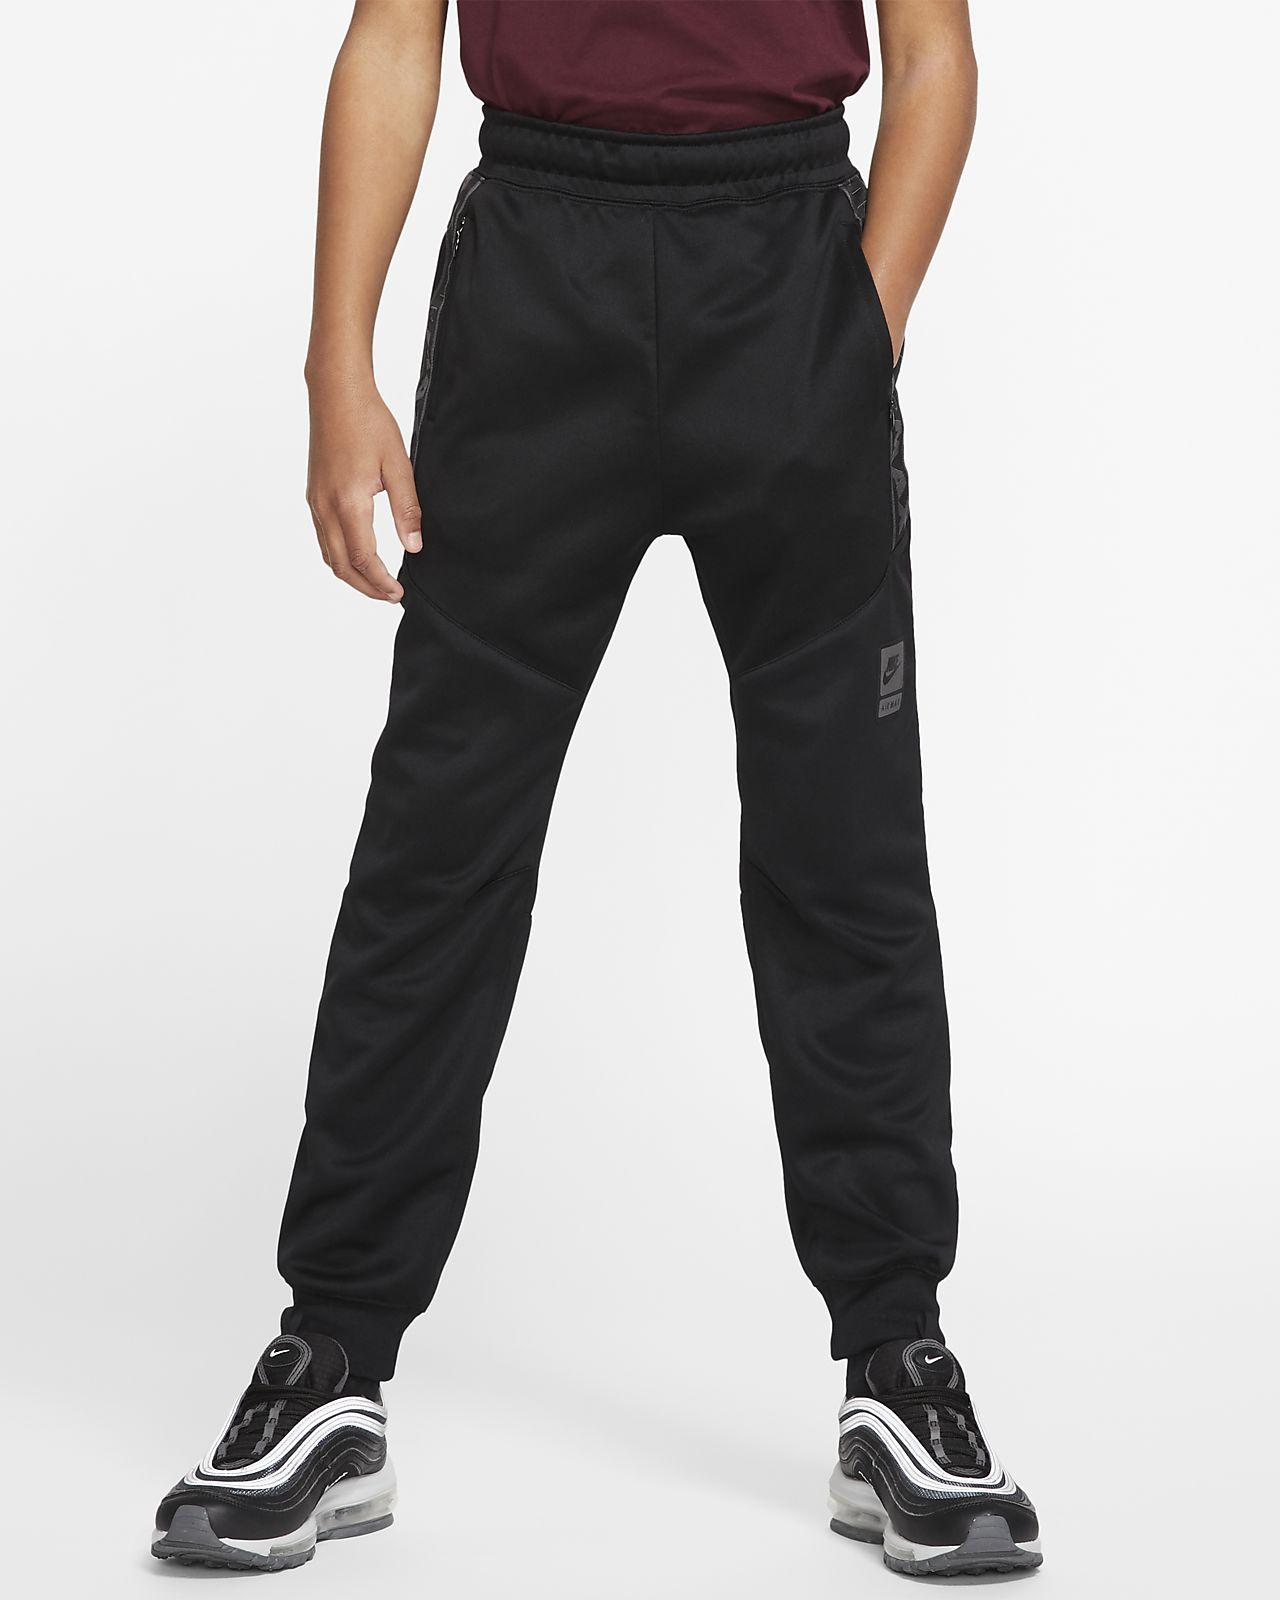 Nike Sportswear Air Max Pantalons - Nen